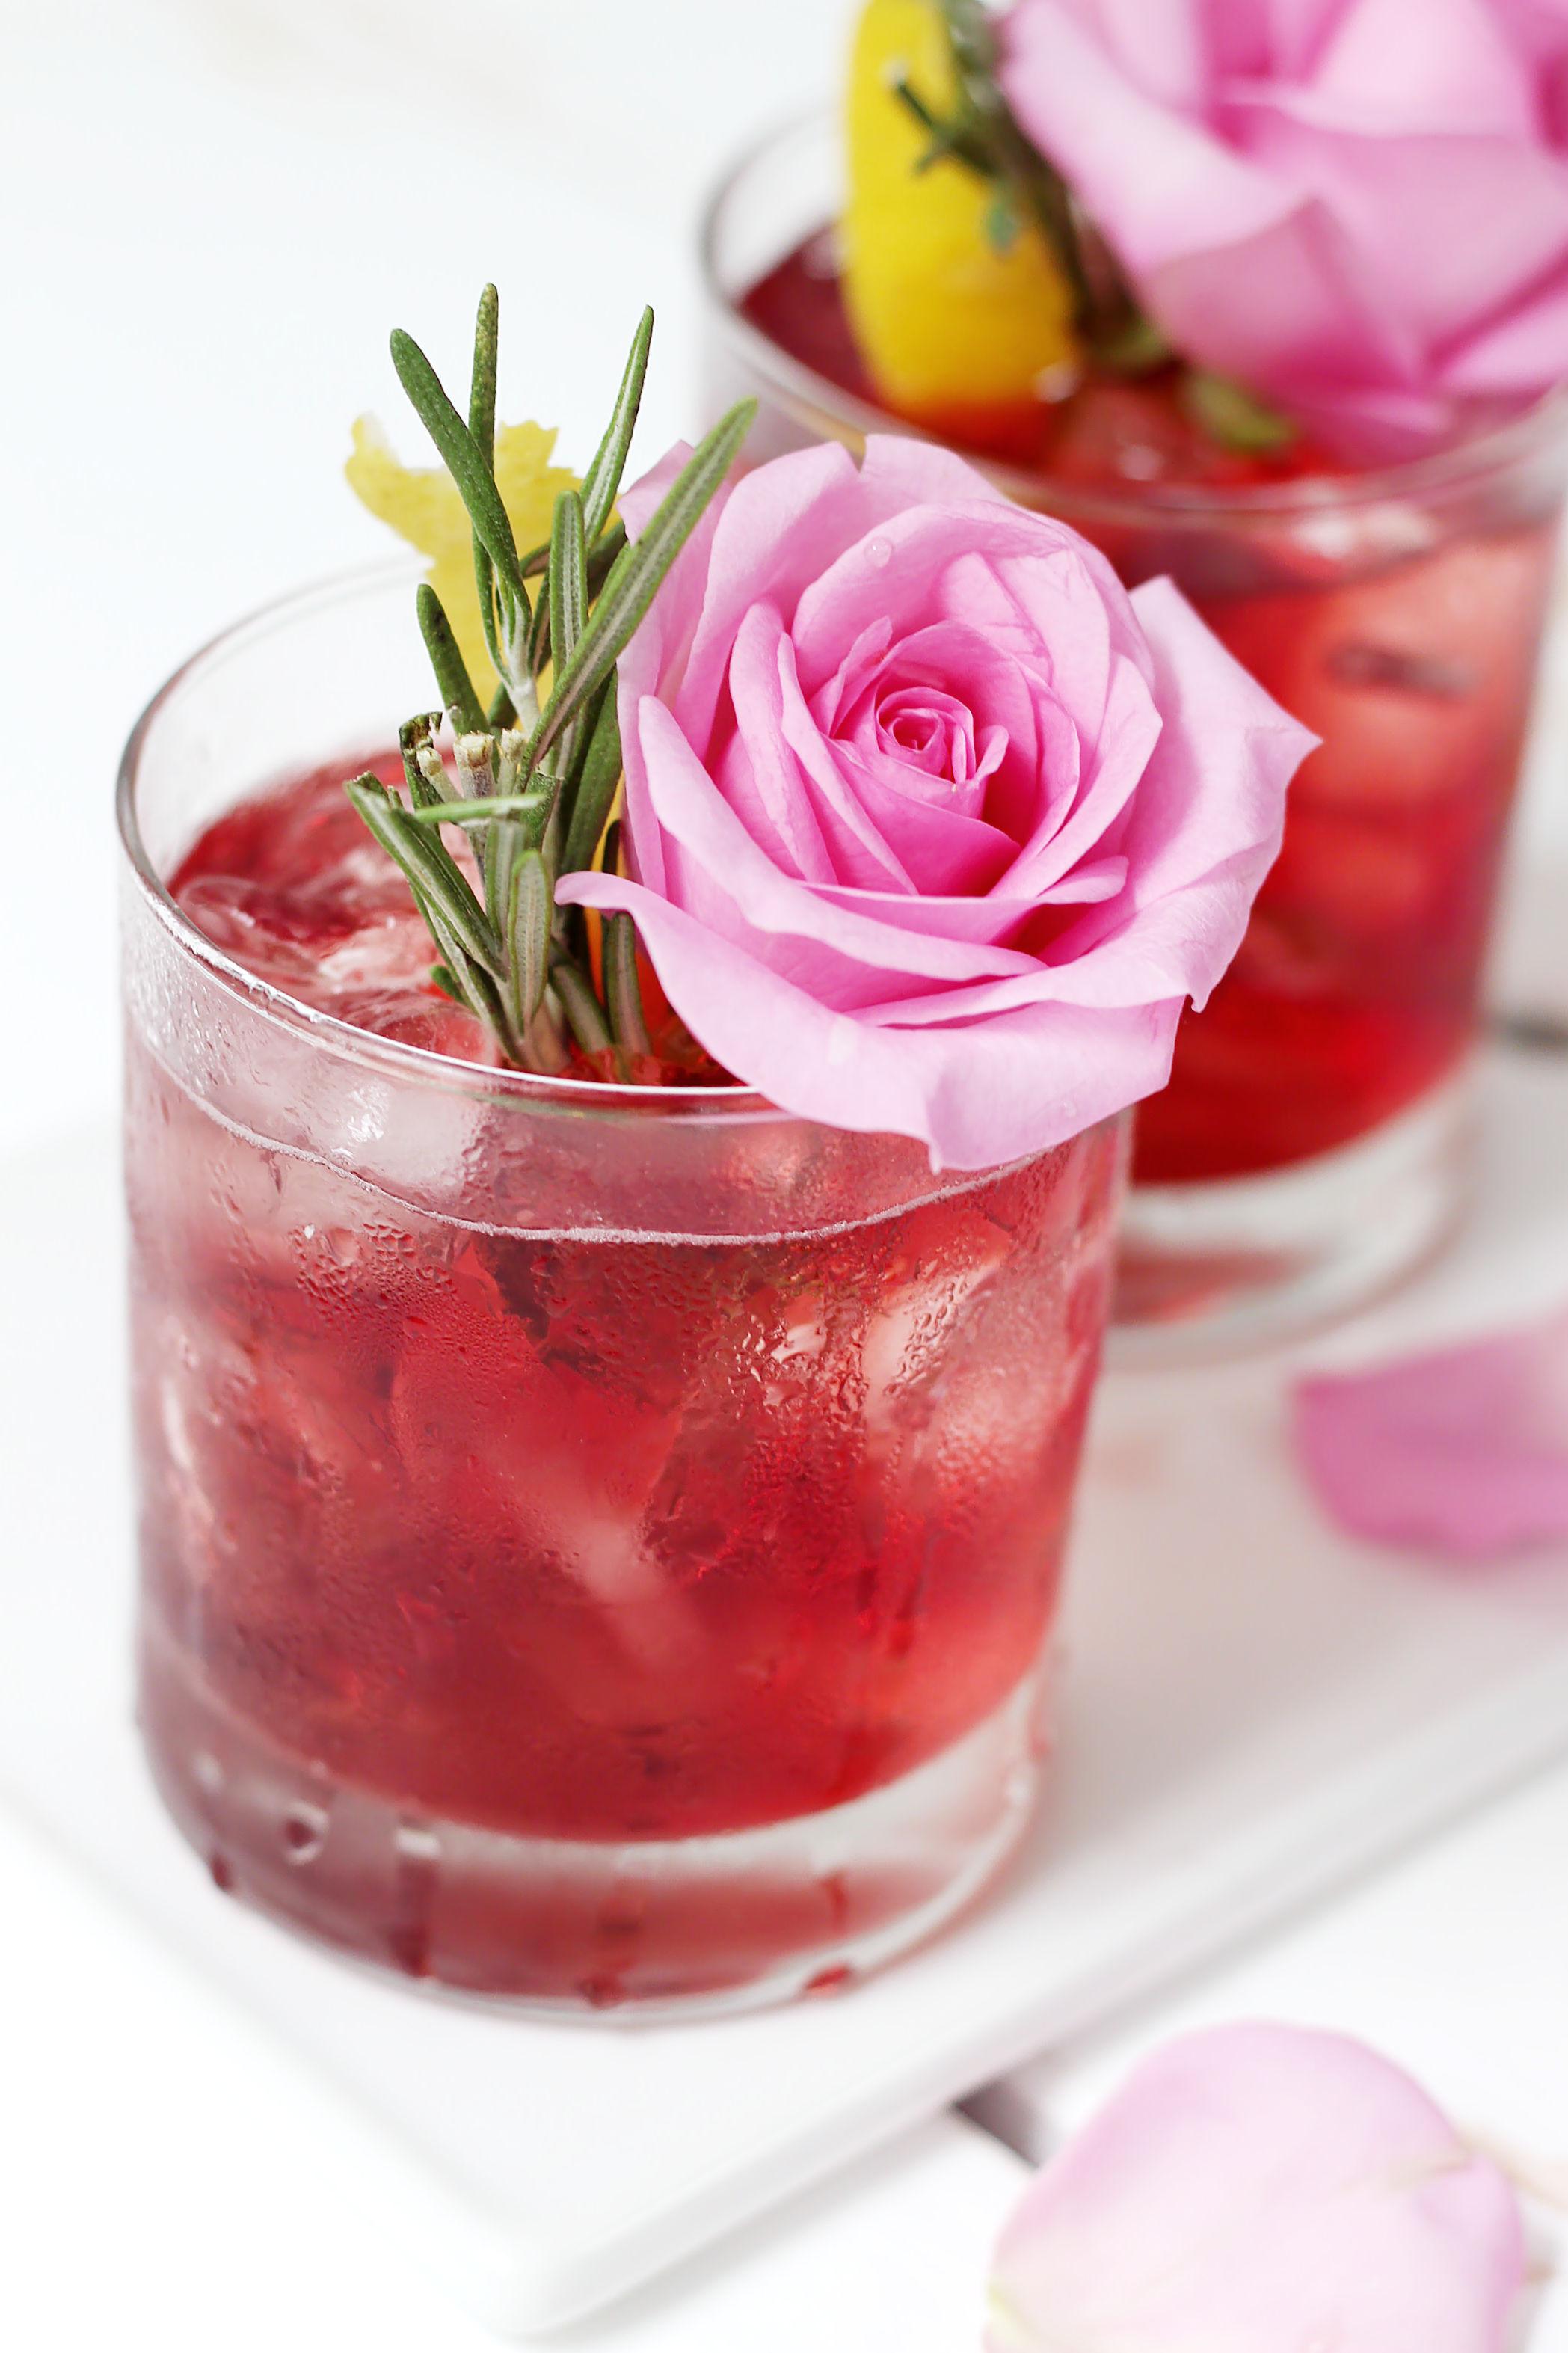 Rezepte-Sommer-Drinks-Rose-Rosmarin-Lillet-Selbermachen-DIY-Blog